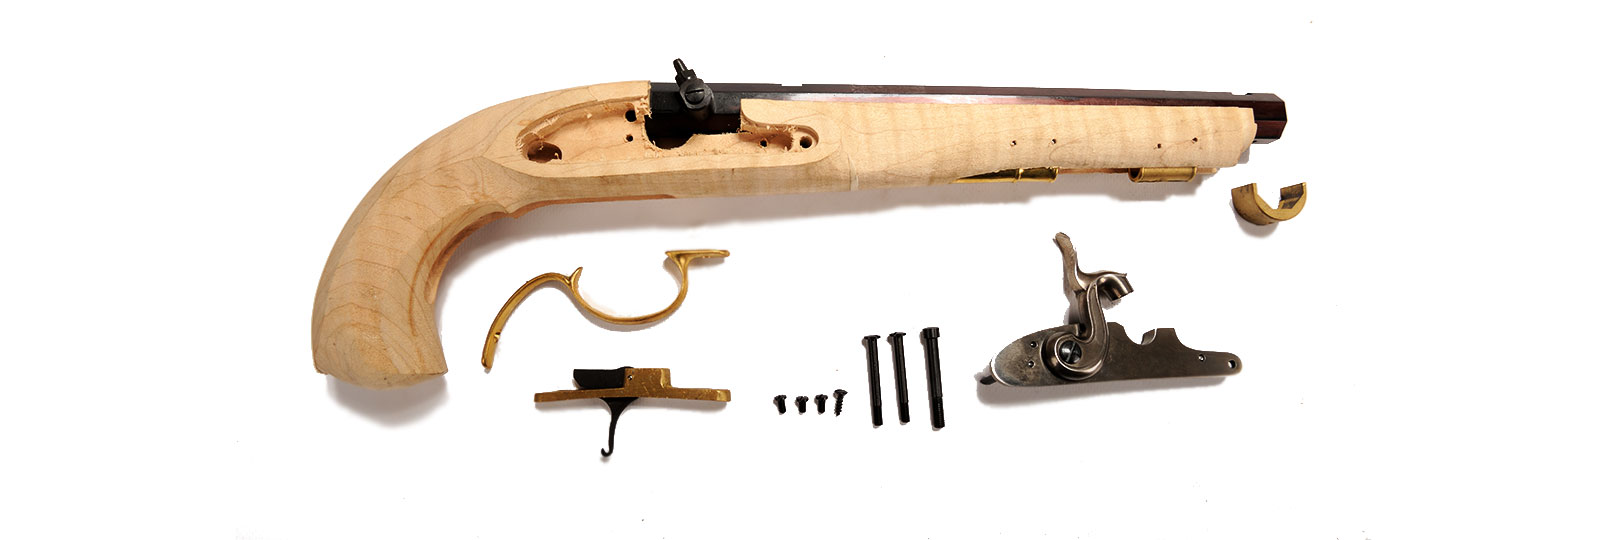 Pistolet Kentucky Maple a Percussion Kit